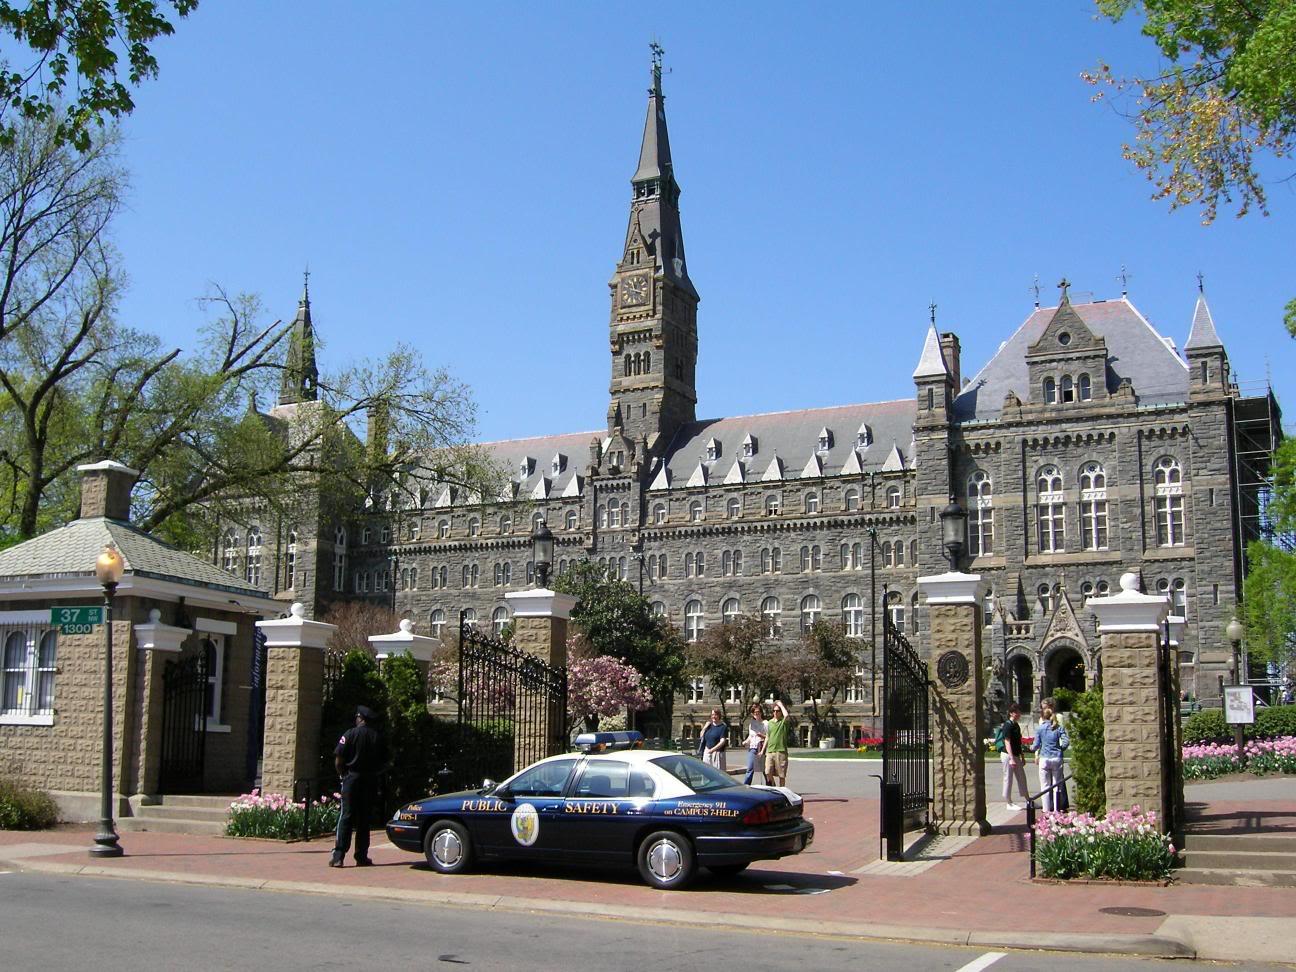 37 Georgetown University Entrance Graphics Code 37 Georgetown 1296x972